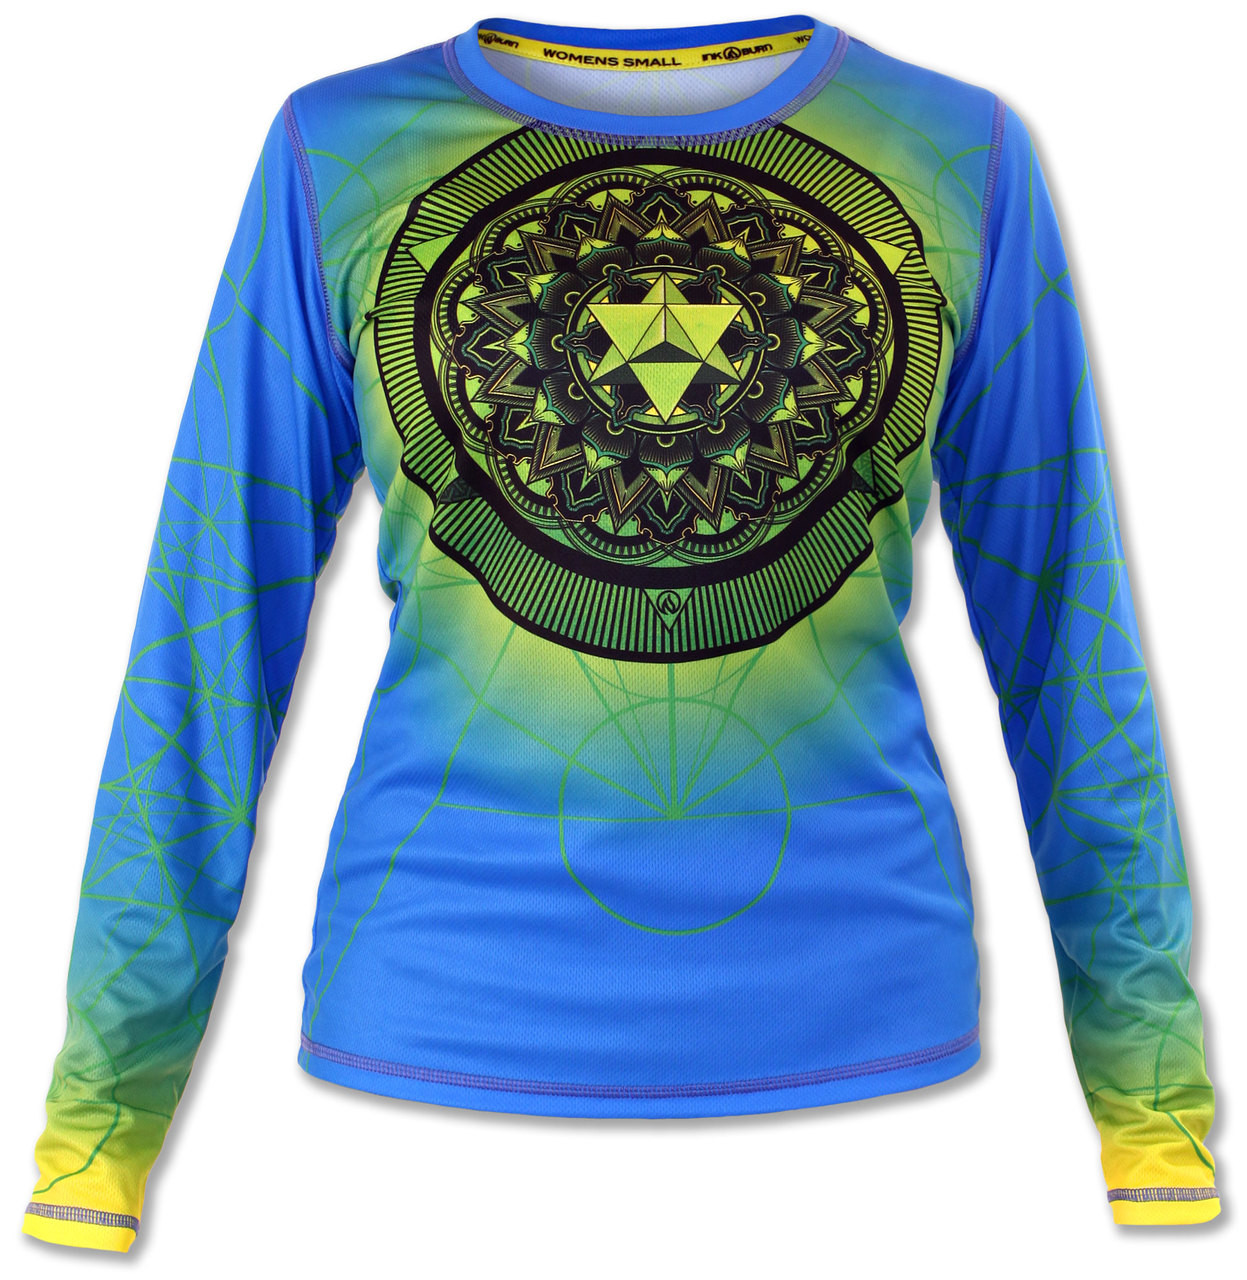 Inknburn women 39 s anahata long sleeve tech shirt for Long sleeve technical running shirt